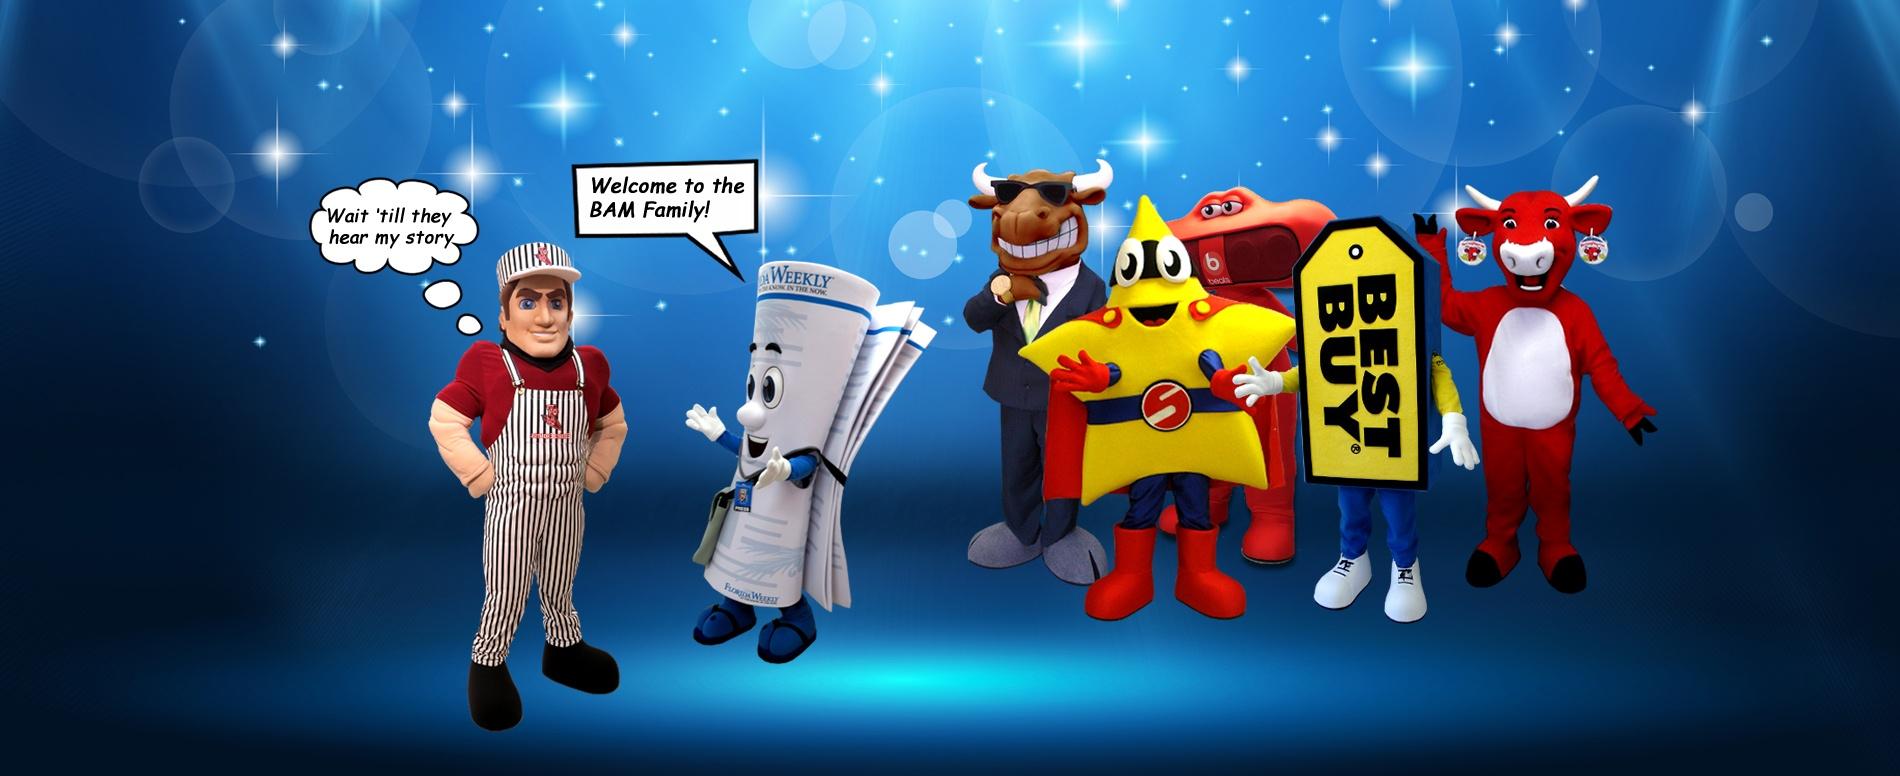 BAM! Mascots - Custom Mascot Design